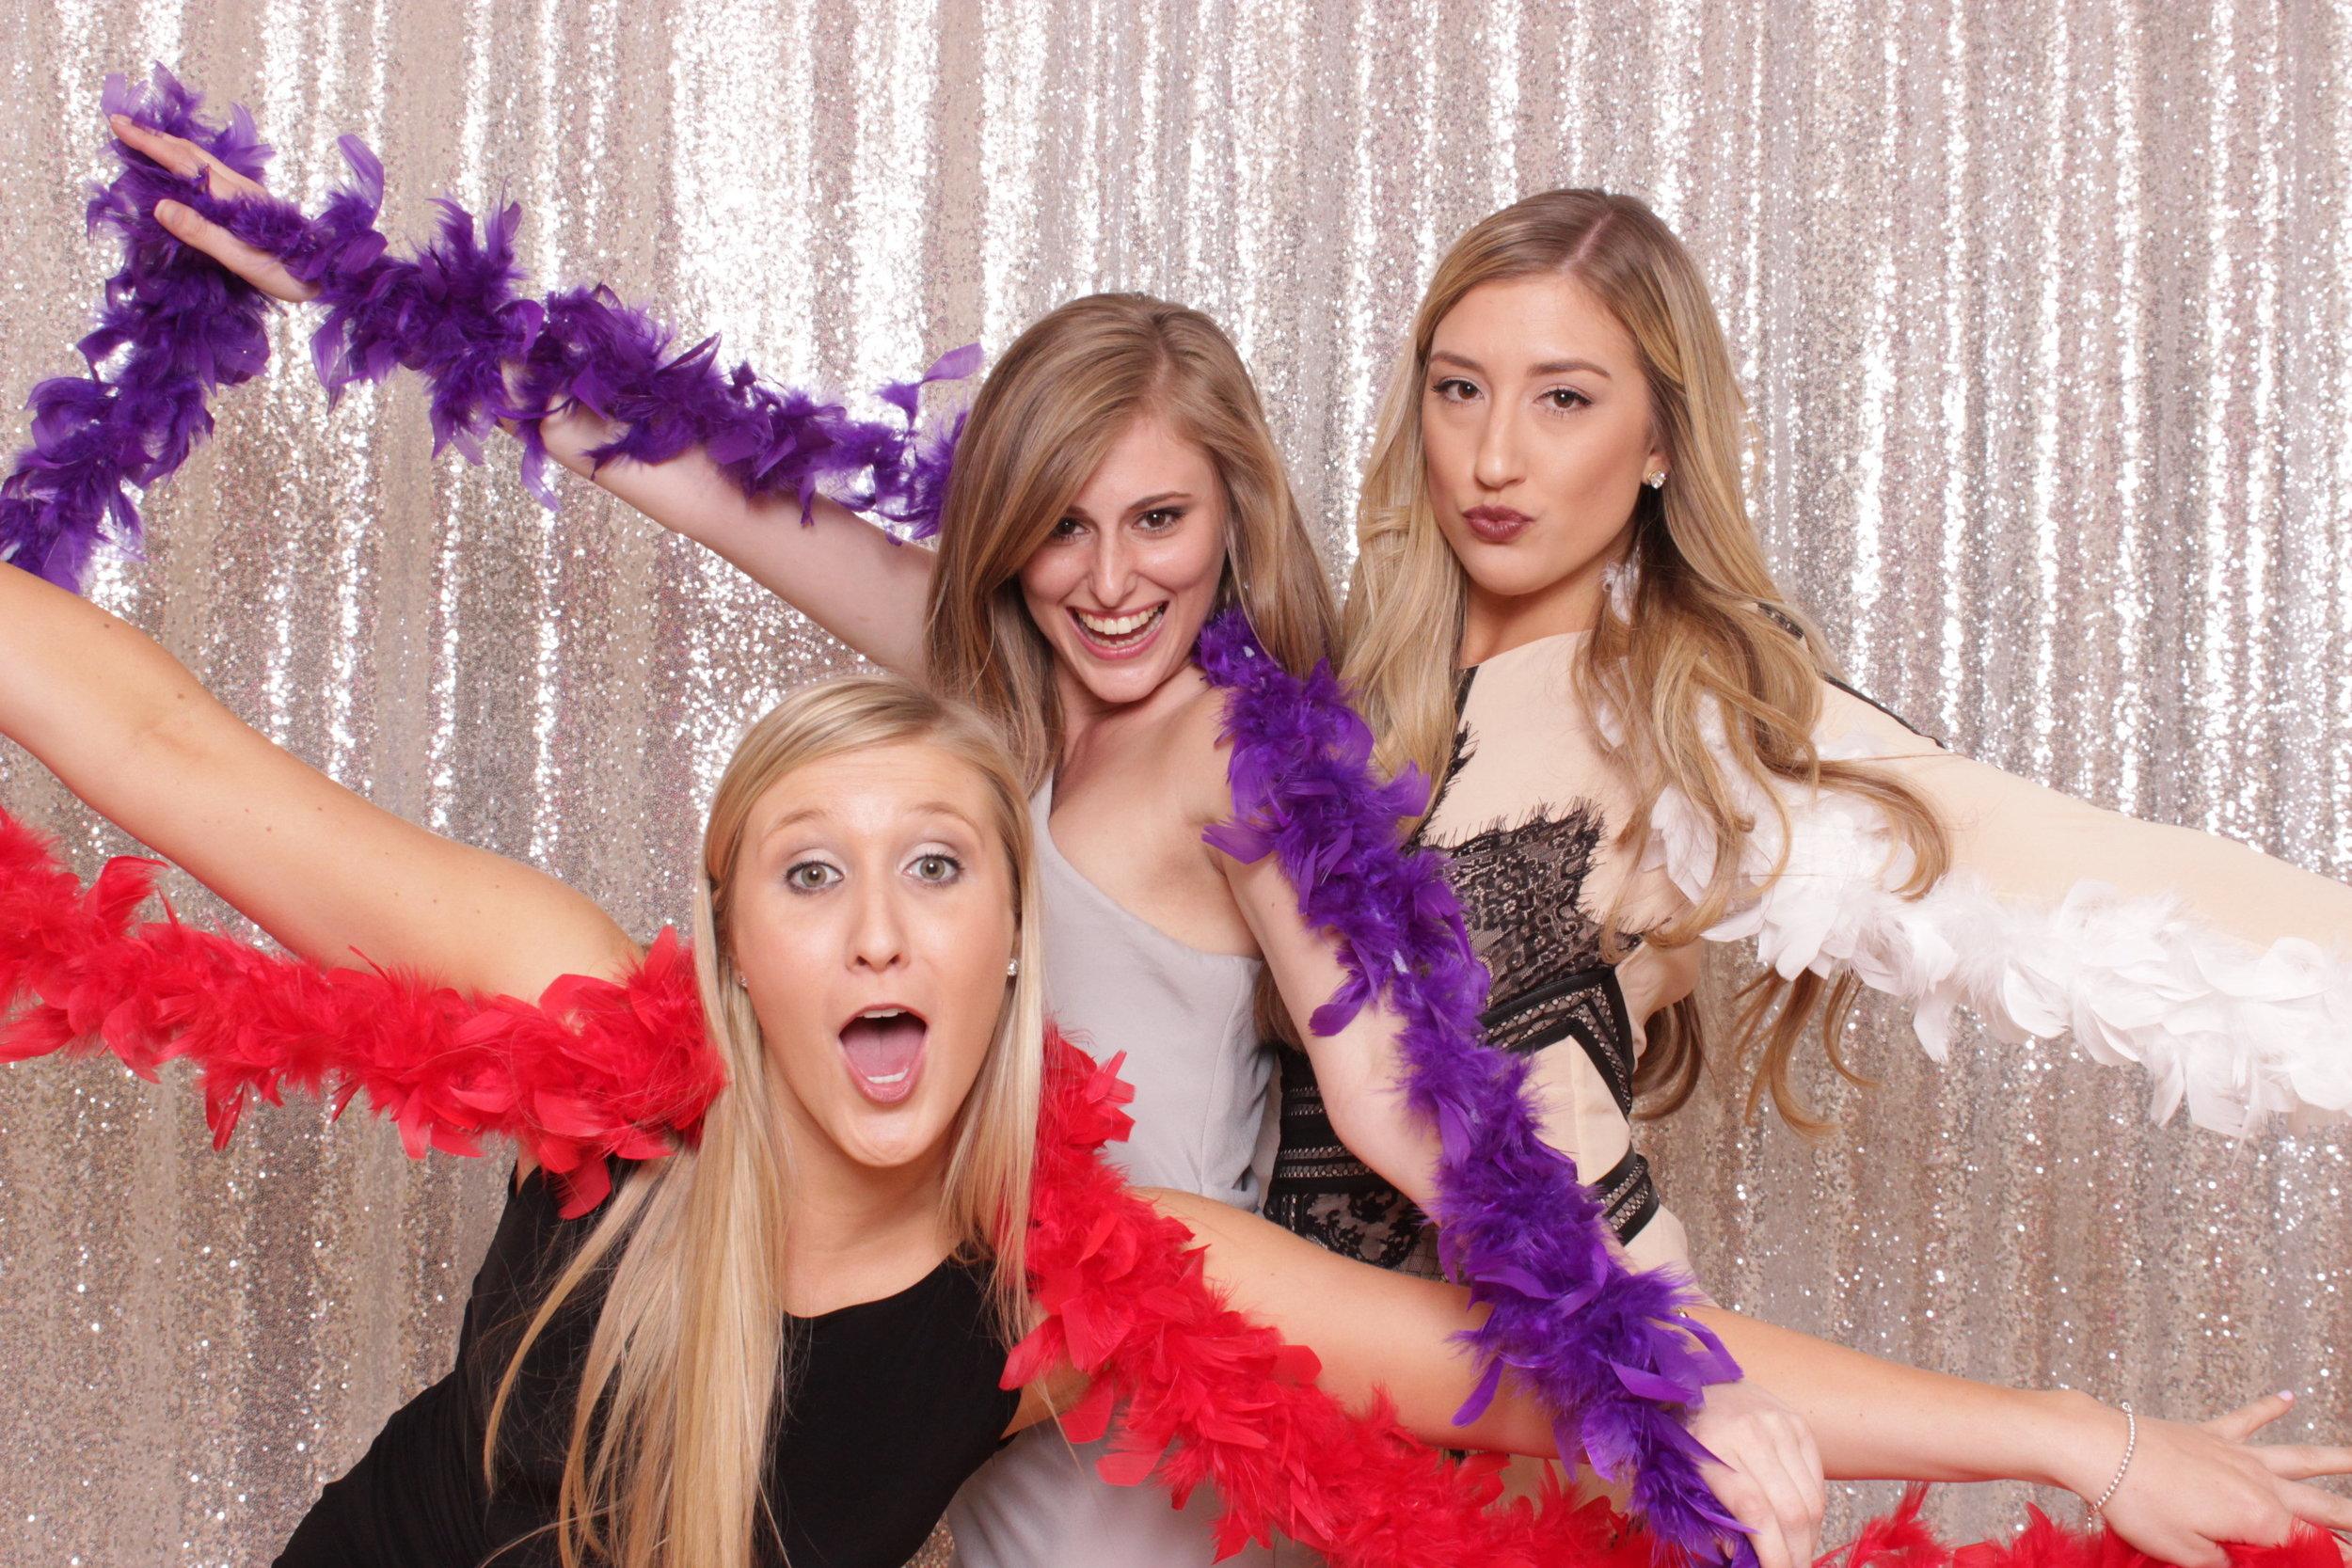 fun-alpha-phi-party-girl-photo-booth-rental-chico-california